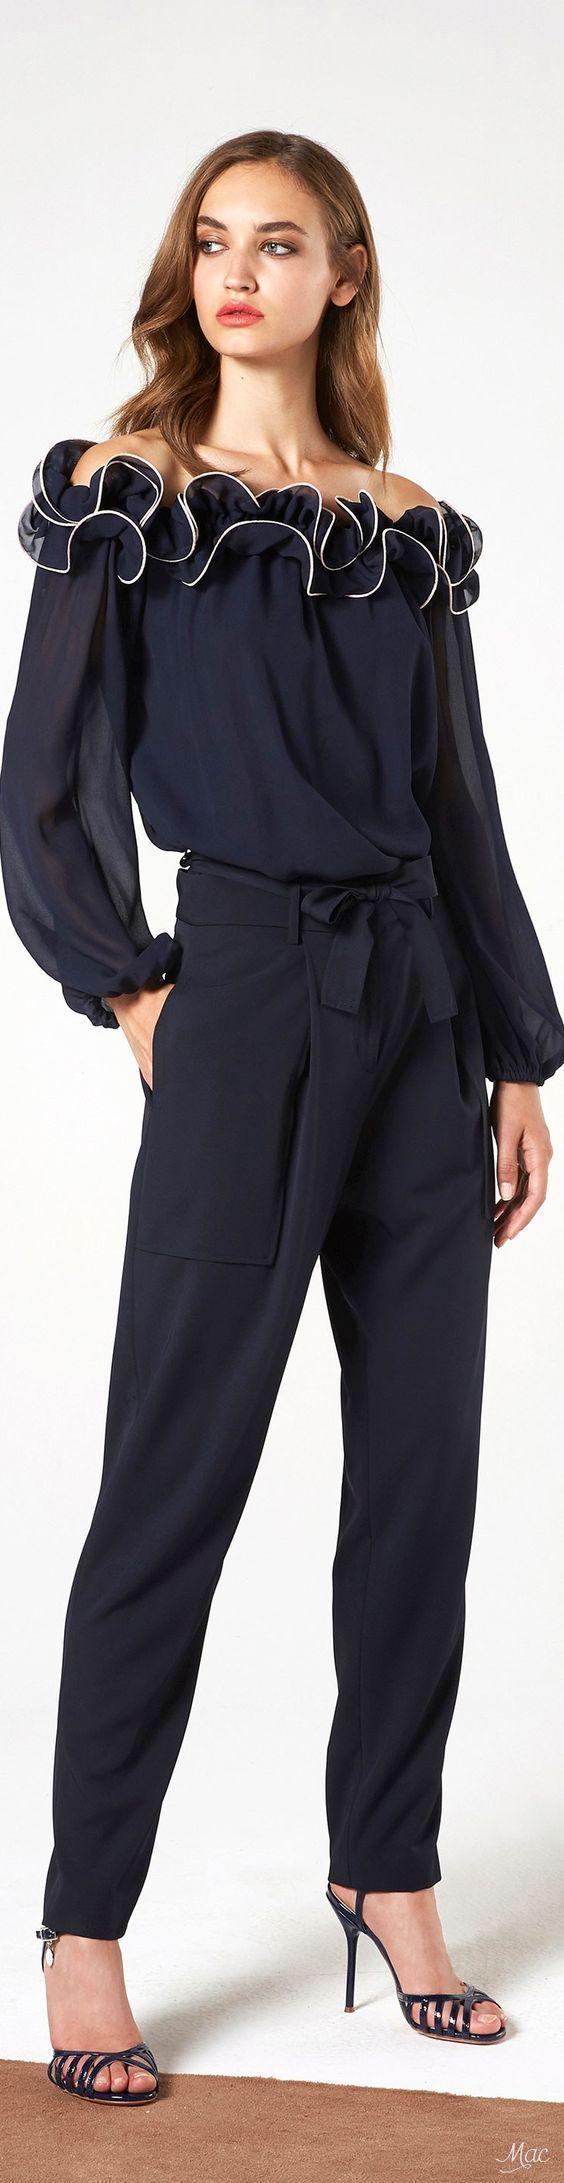 @roressclothes clothing ideas #women fashion black jumpsuit Resort 2018 Blumarine